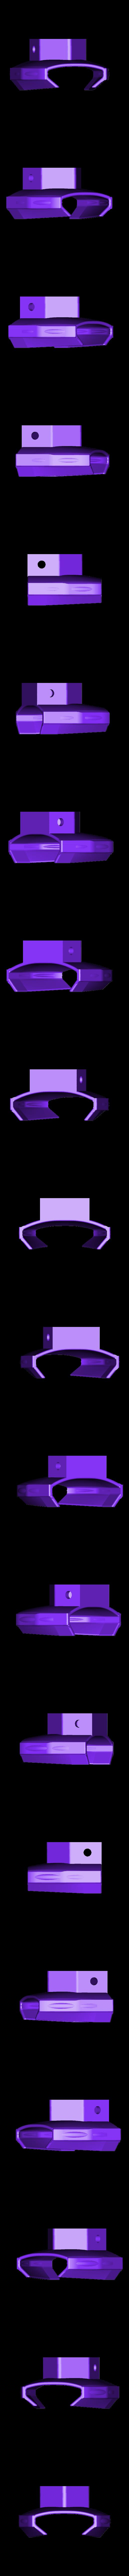 Camera_pole_attachment_6.stl Download free STL file Ski Pole Adapter for Sony DSC-WX1 • Object to 3D print, mschiller